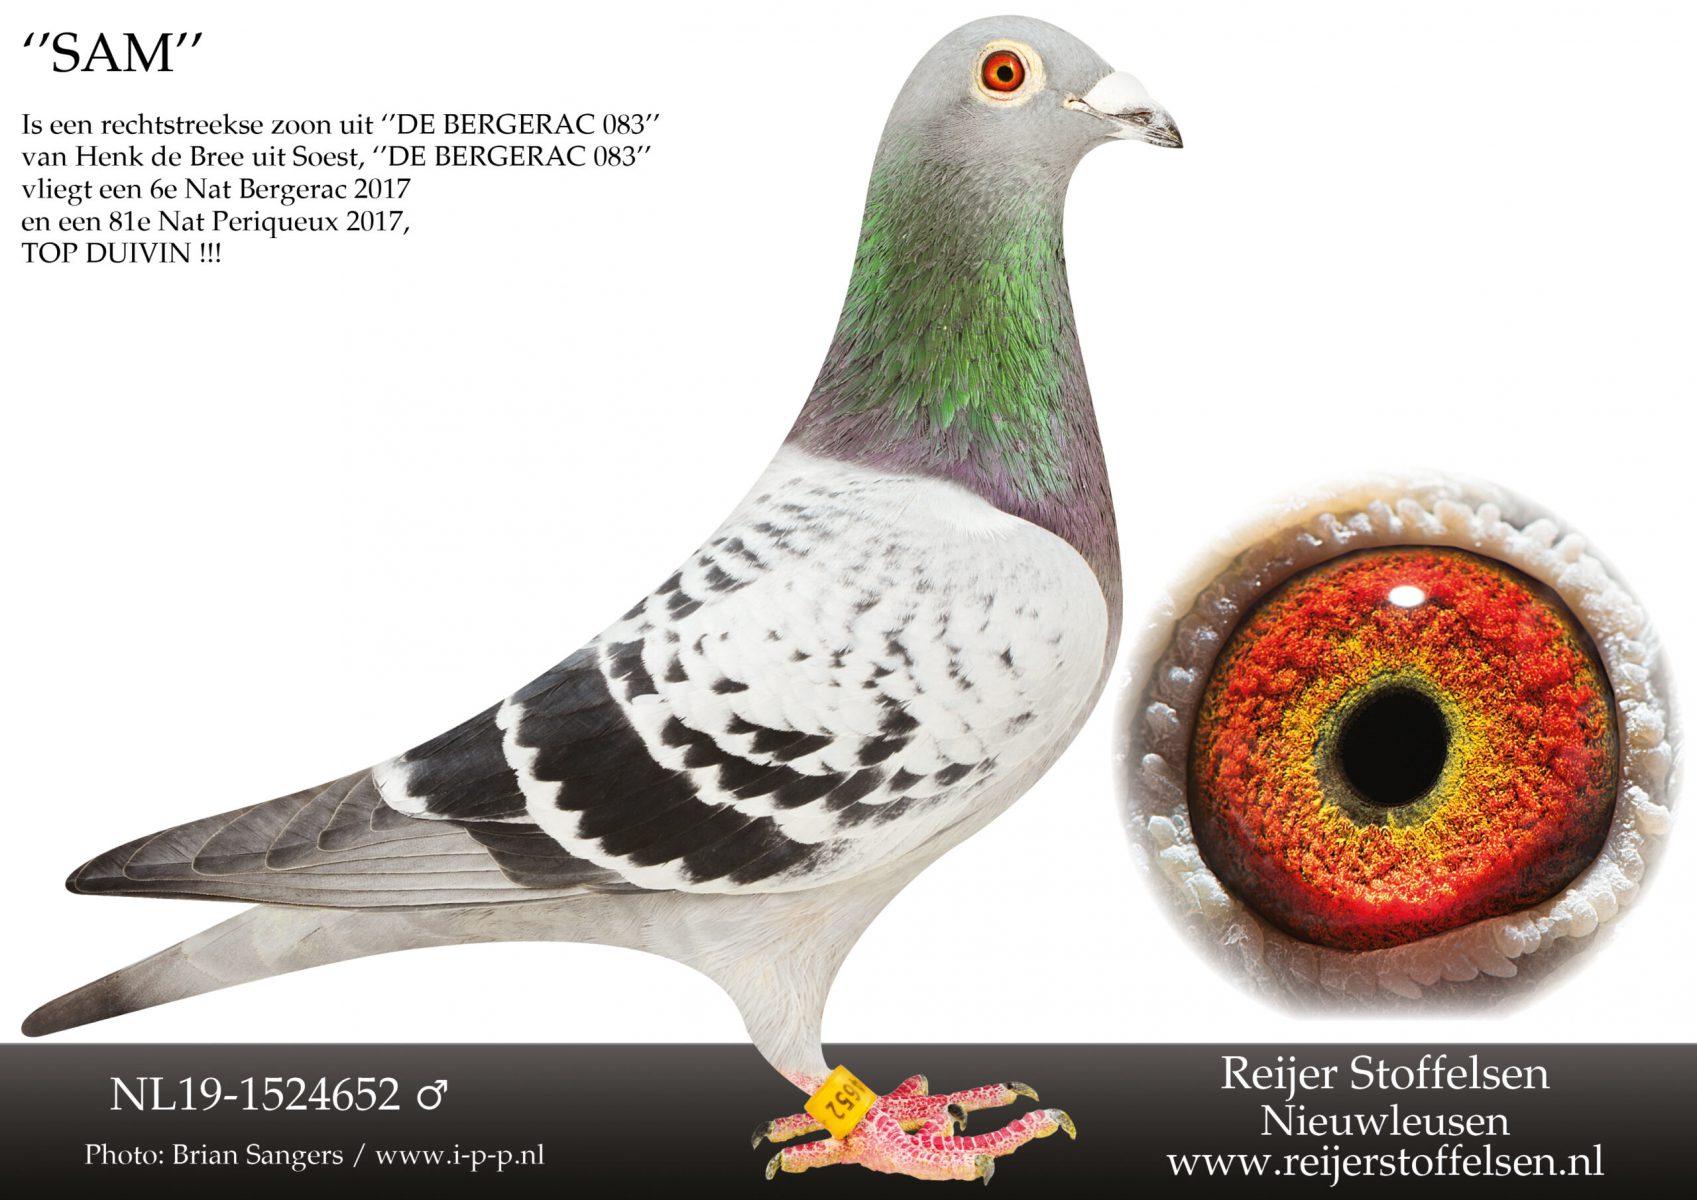 NL19-1524652-scaled